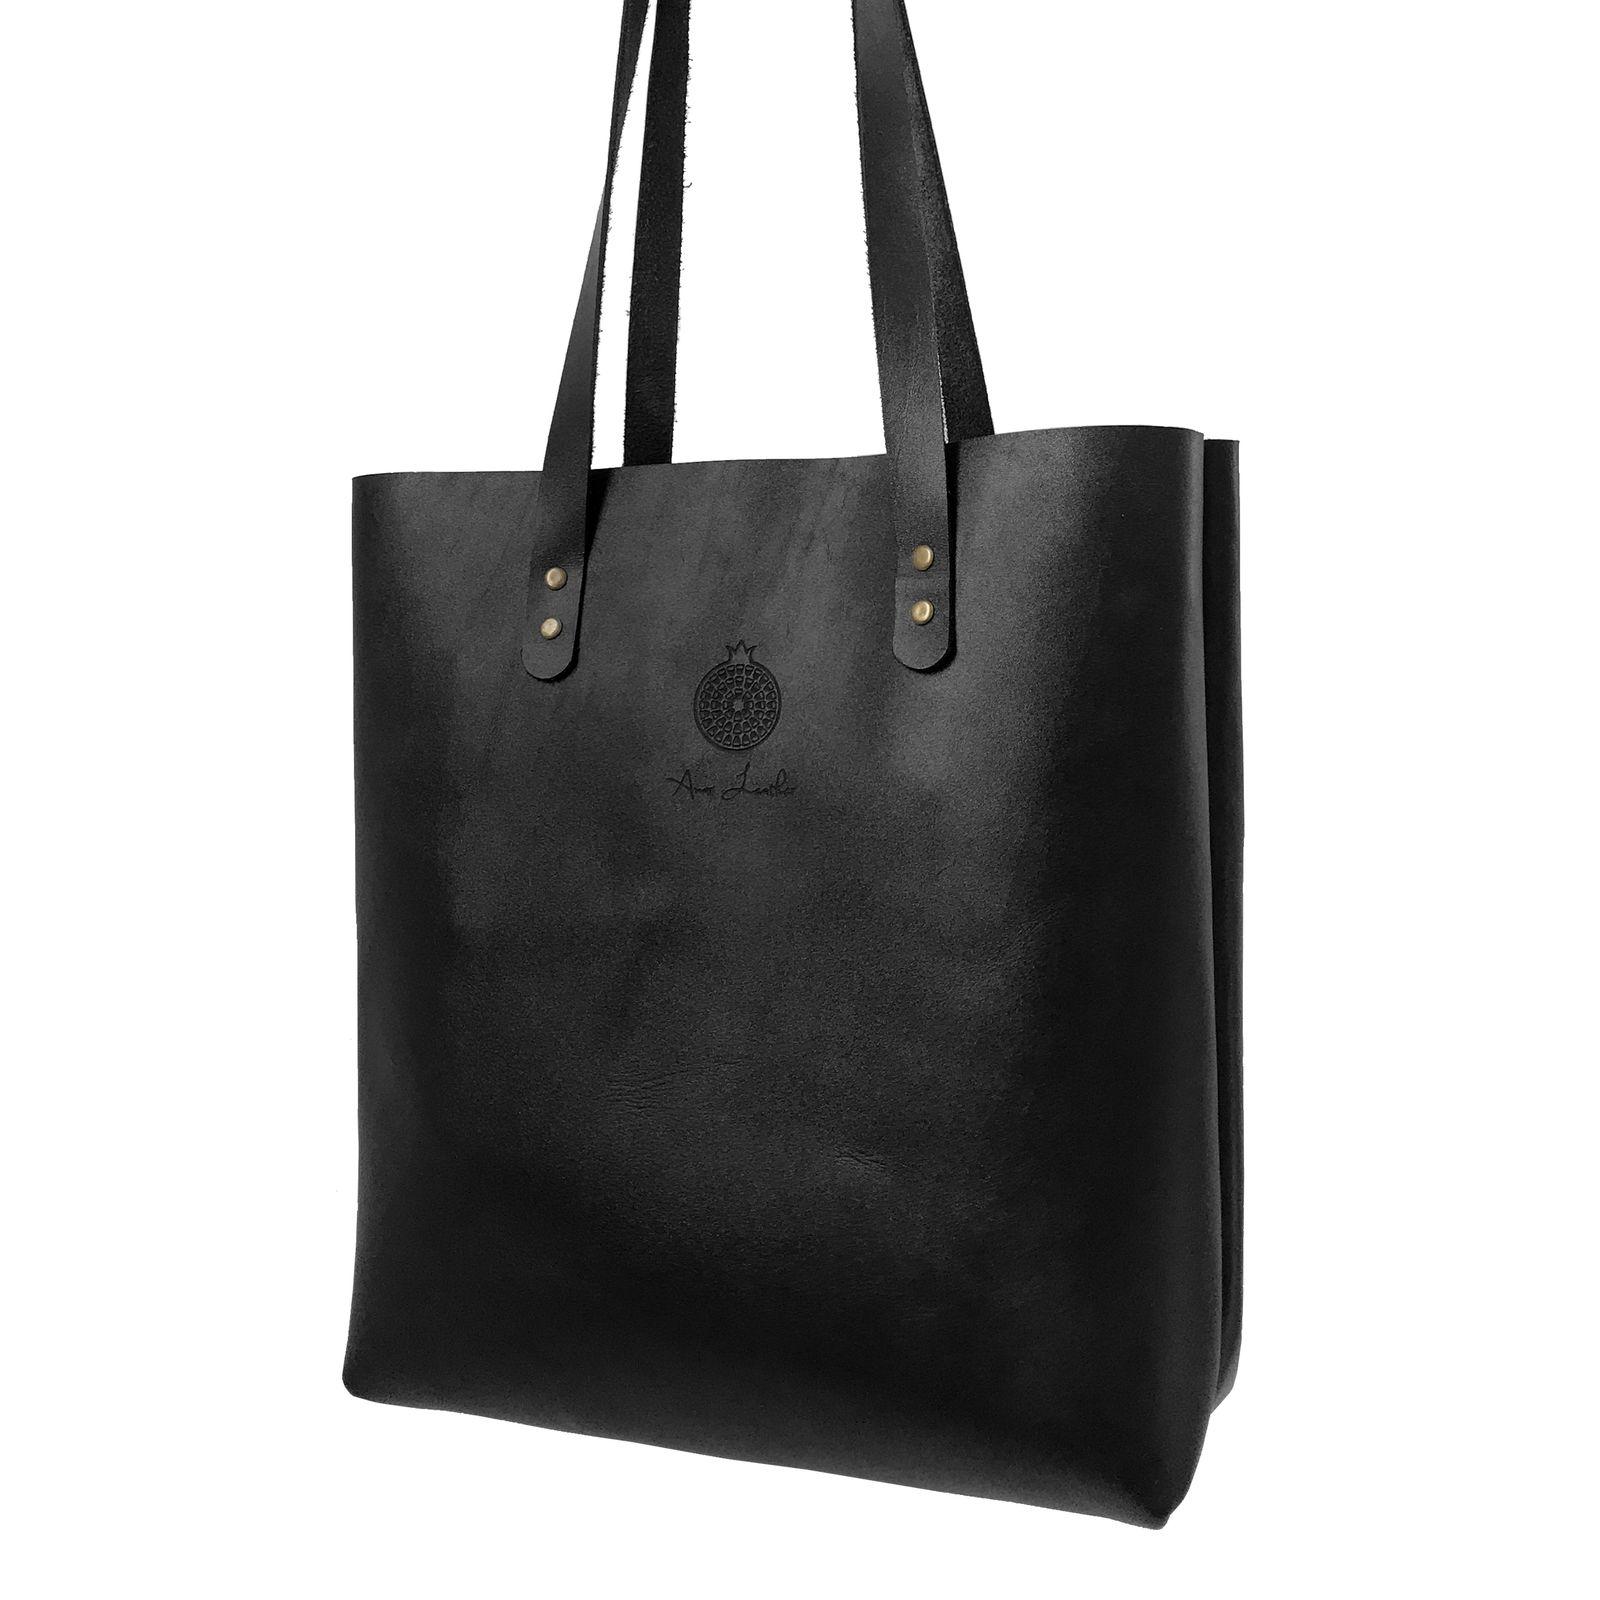 کیف دوشی زنانه انار لدر مدل کارینا -  - 7